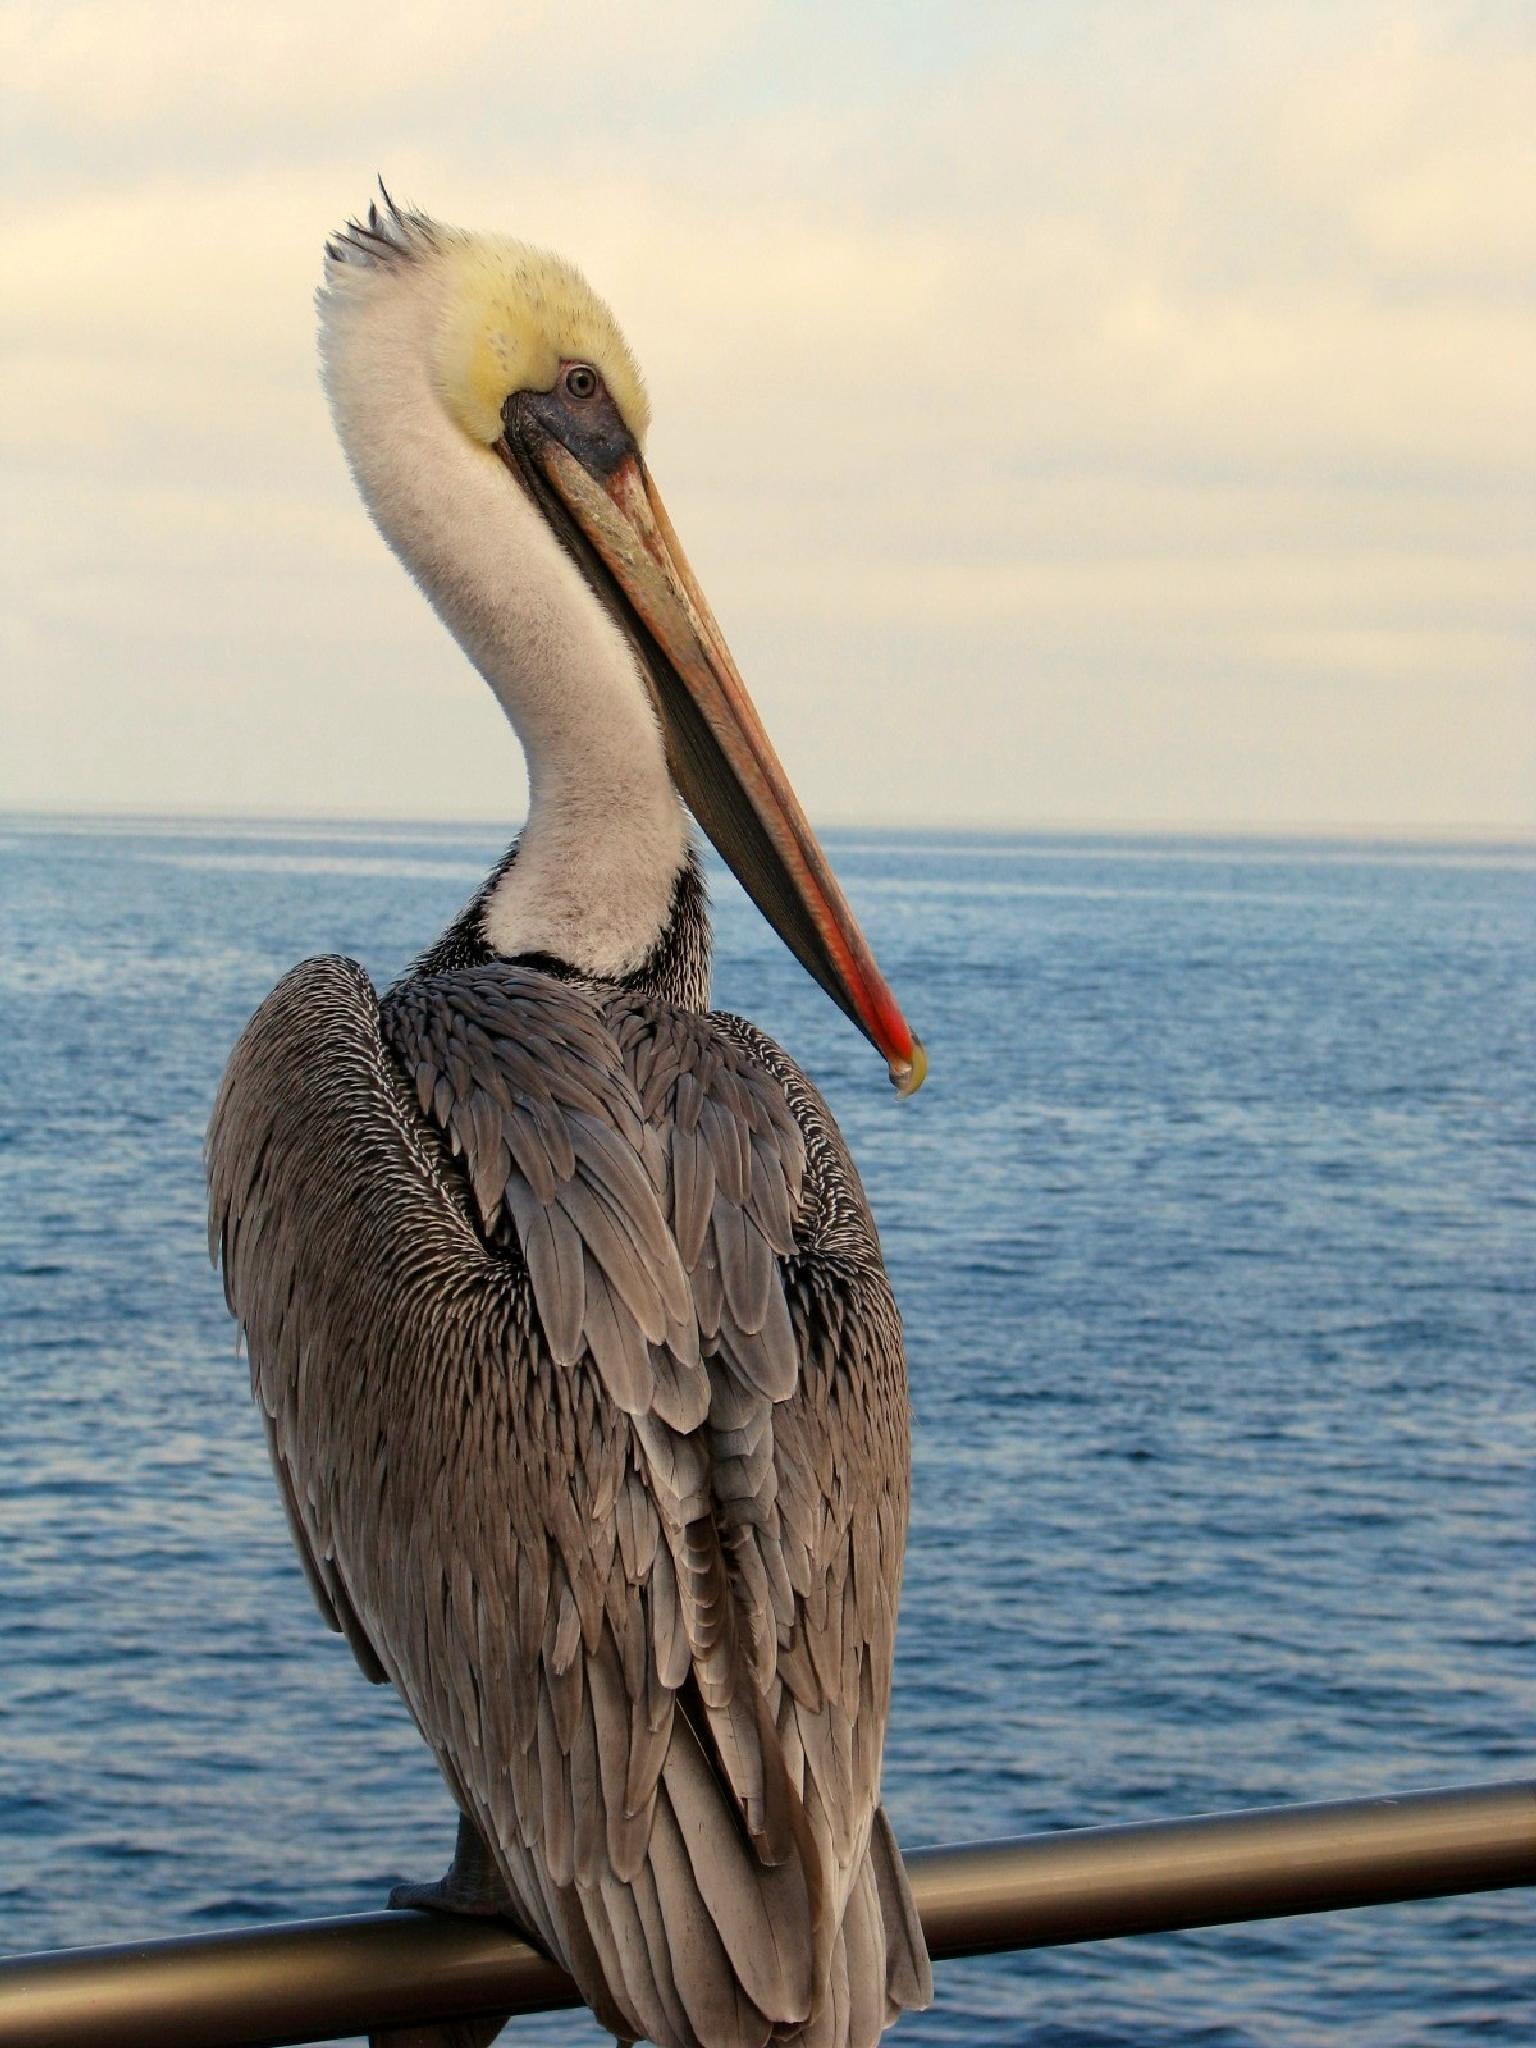 Pelican Profile by Lisa Rimlinger